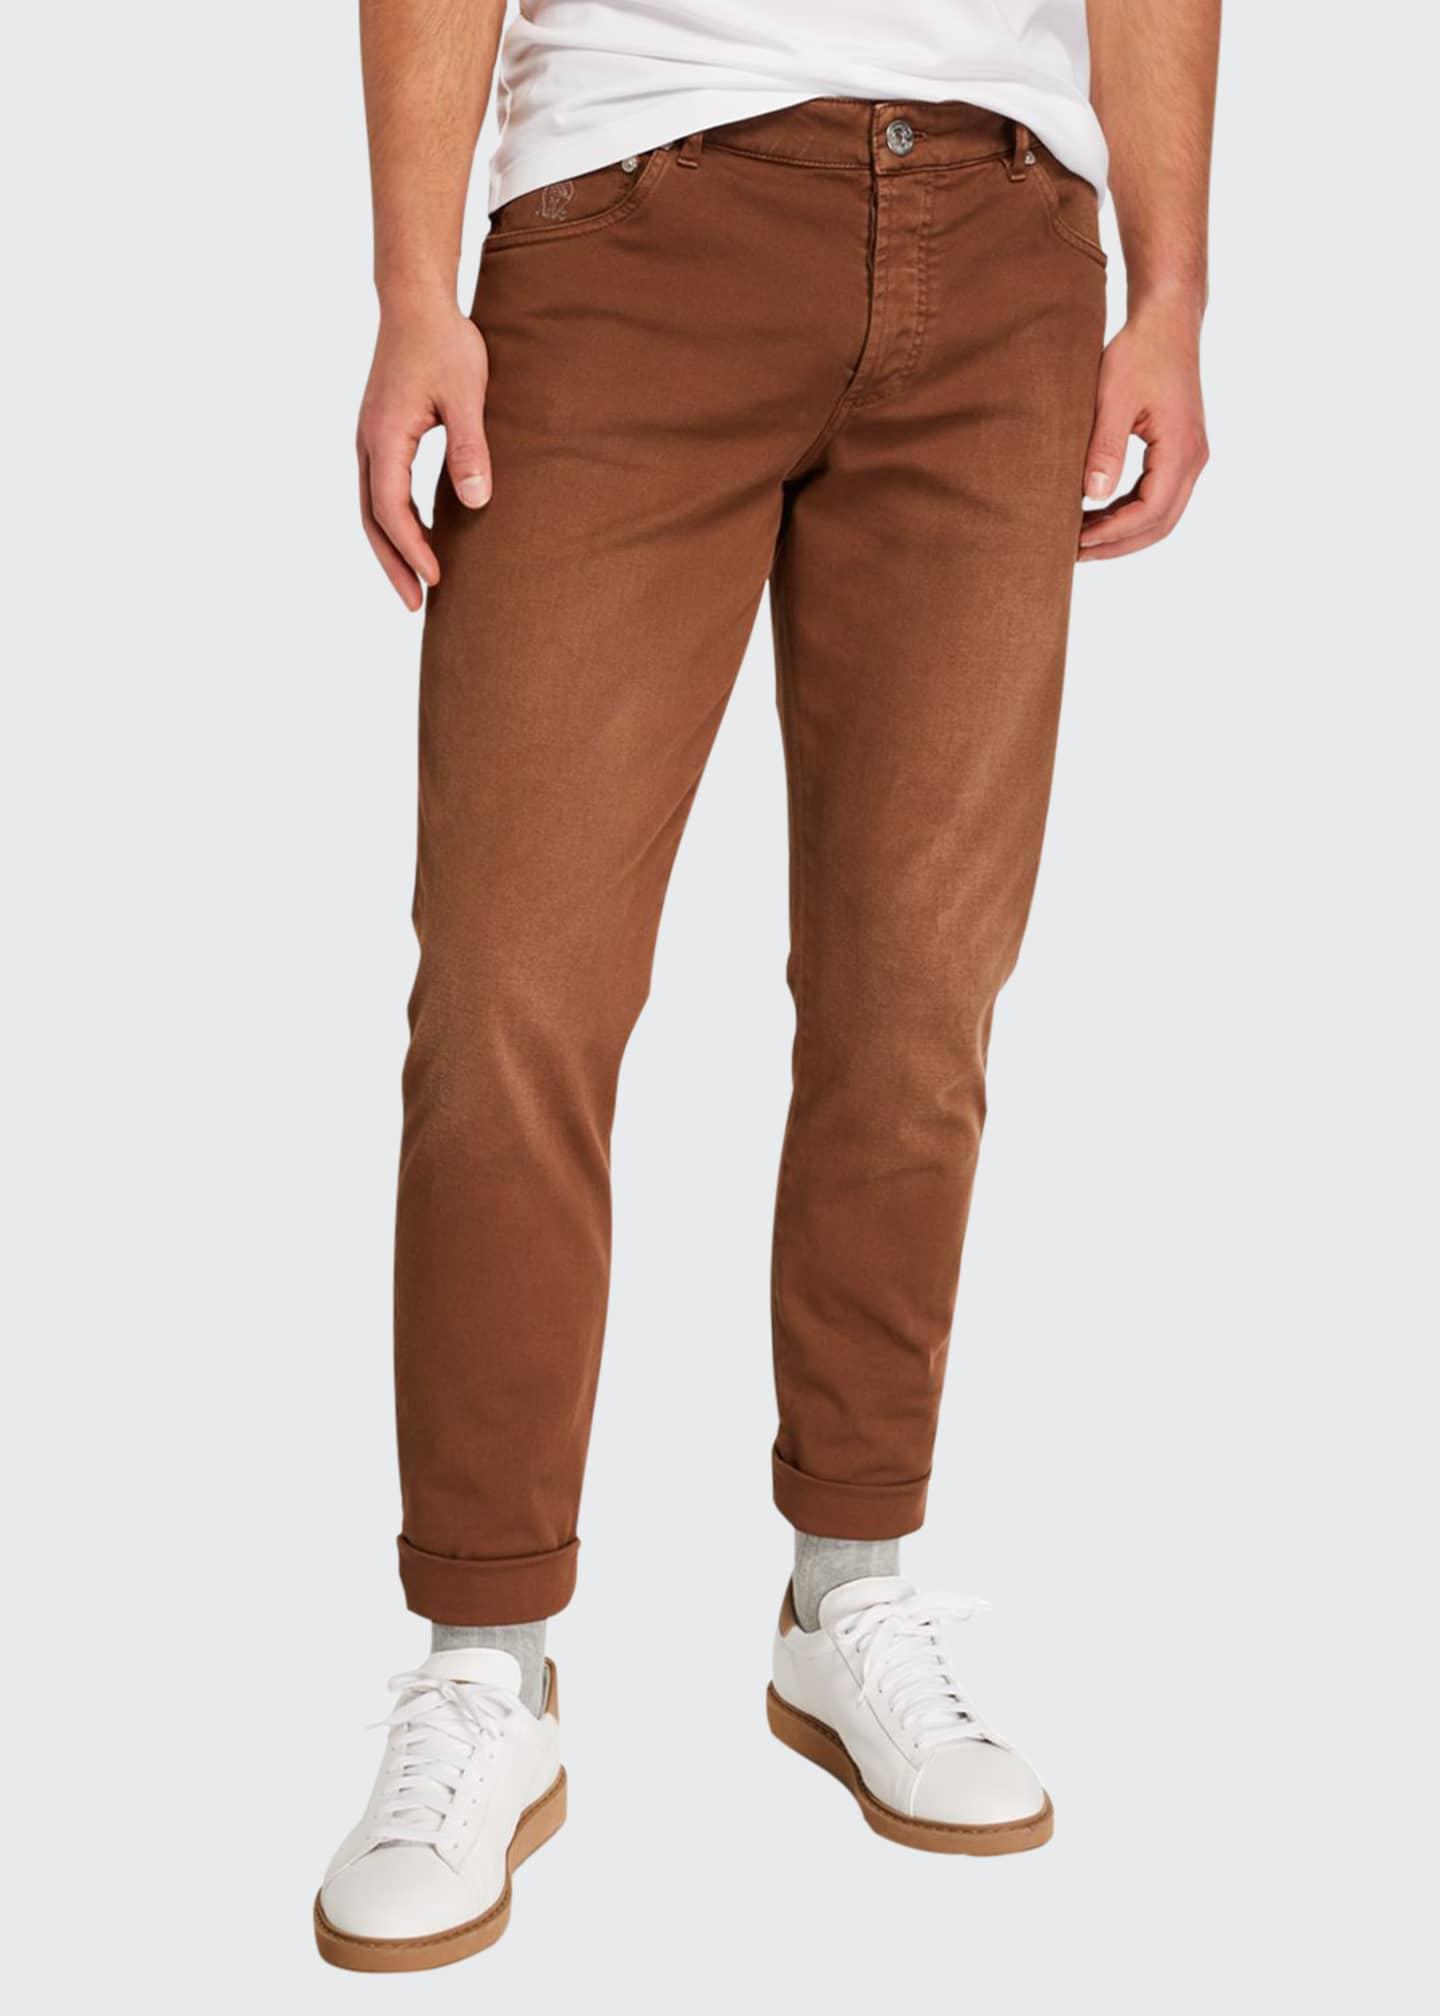 Brunello Cucinelli Men's Slim-Fit Over-Dye Twill Jeans